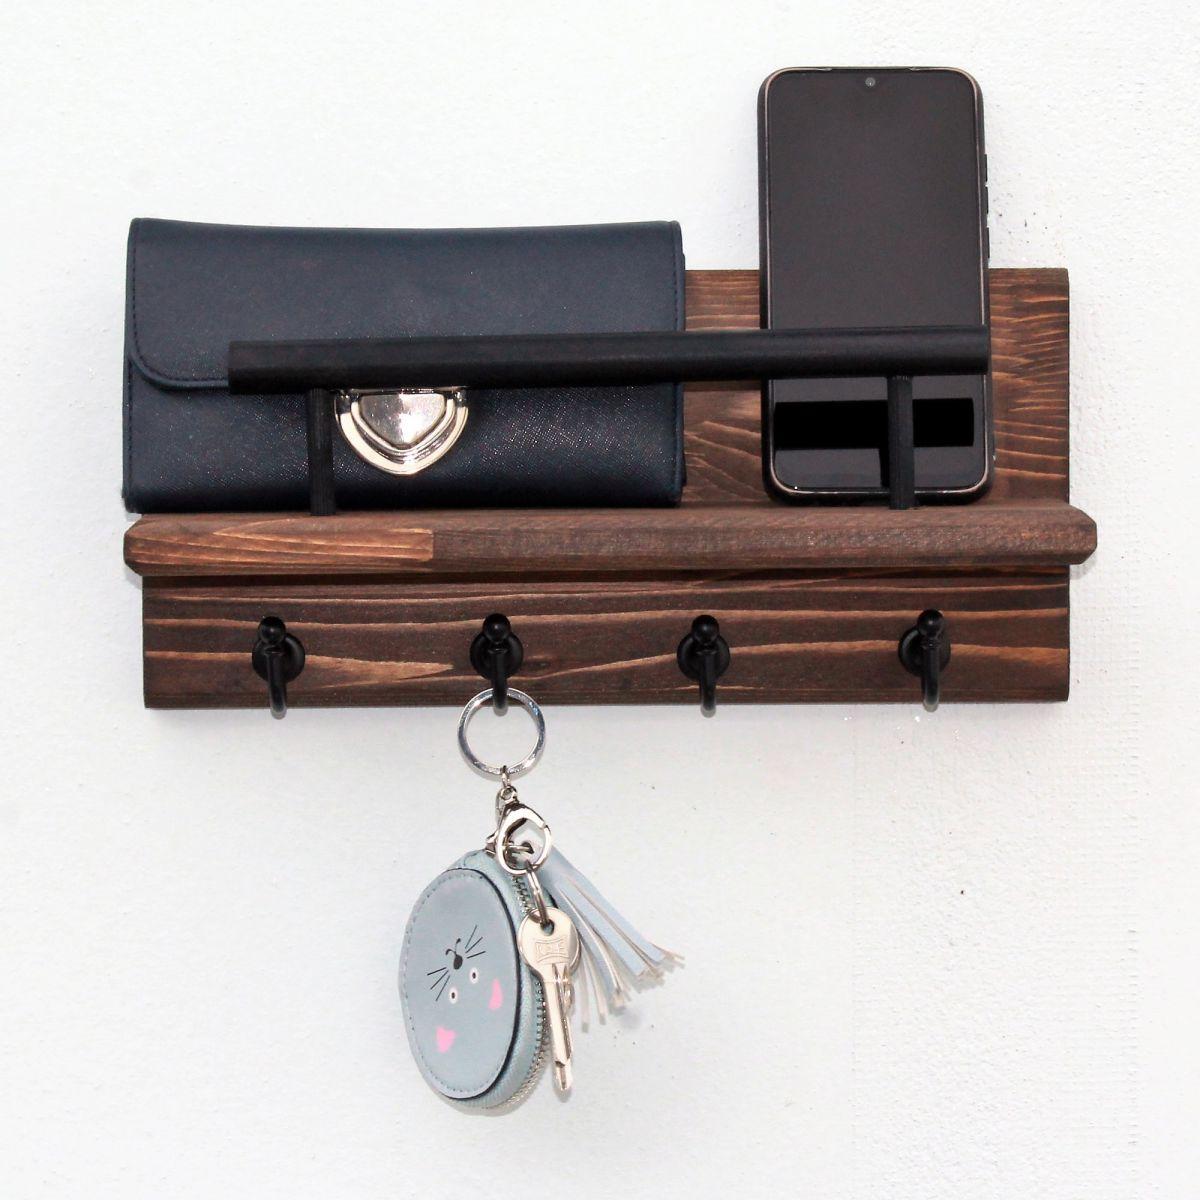 Cuier din lemn cu 4 agatatori cod 1006 Homs 32x 15 cm, maro nuc